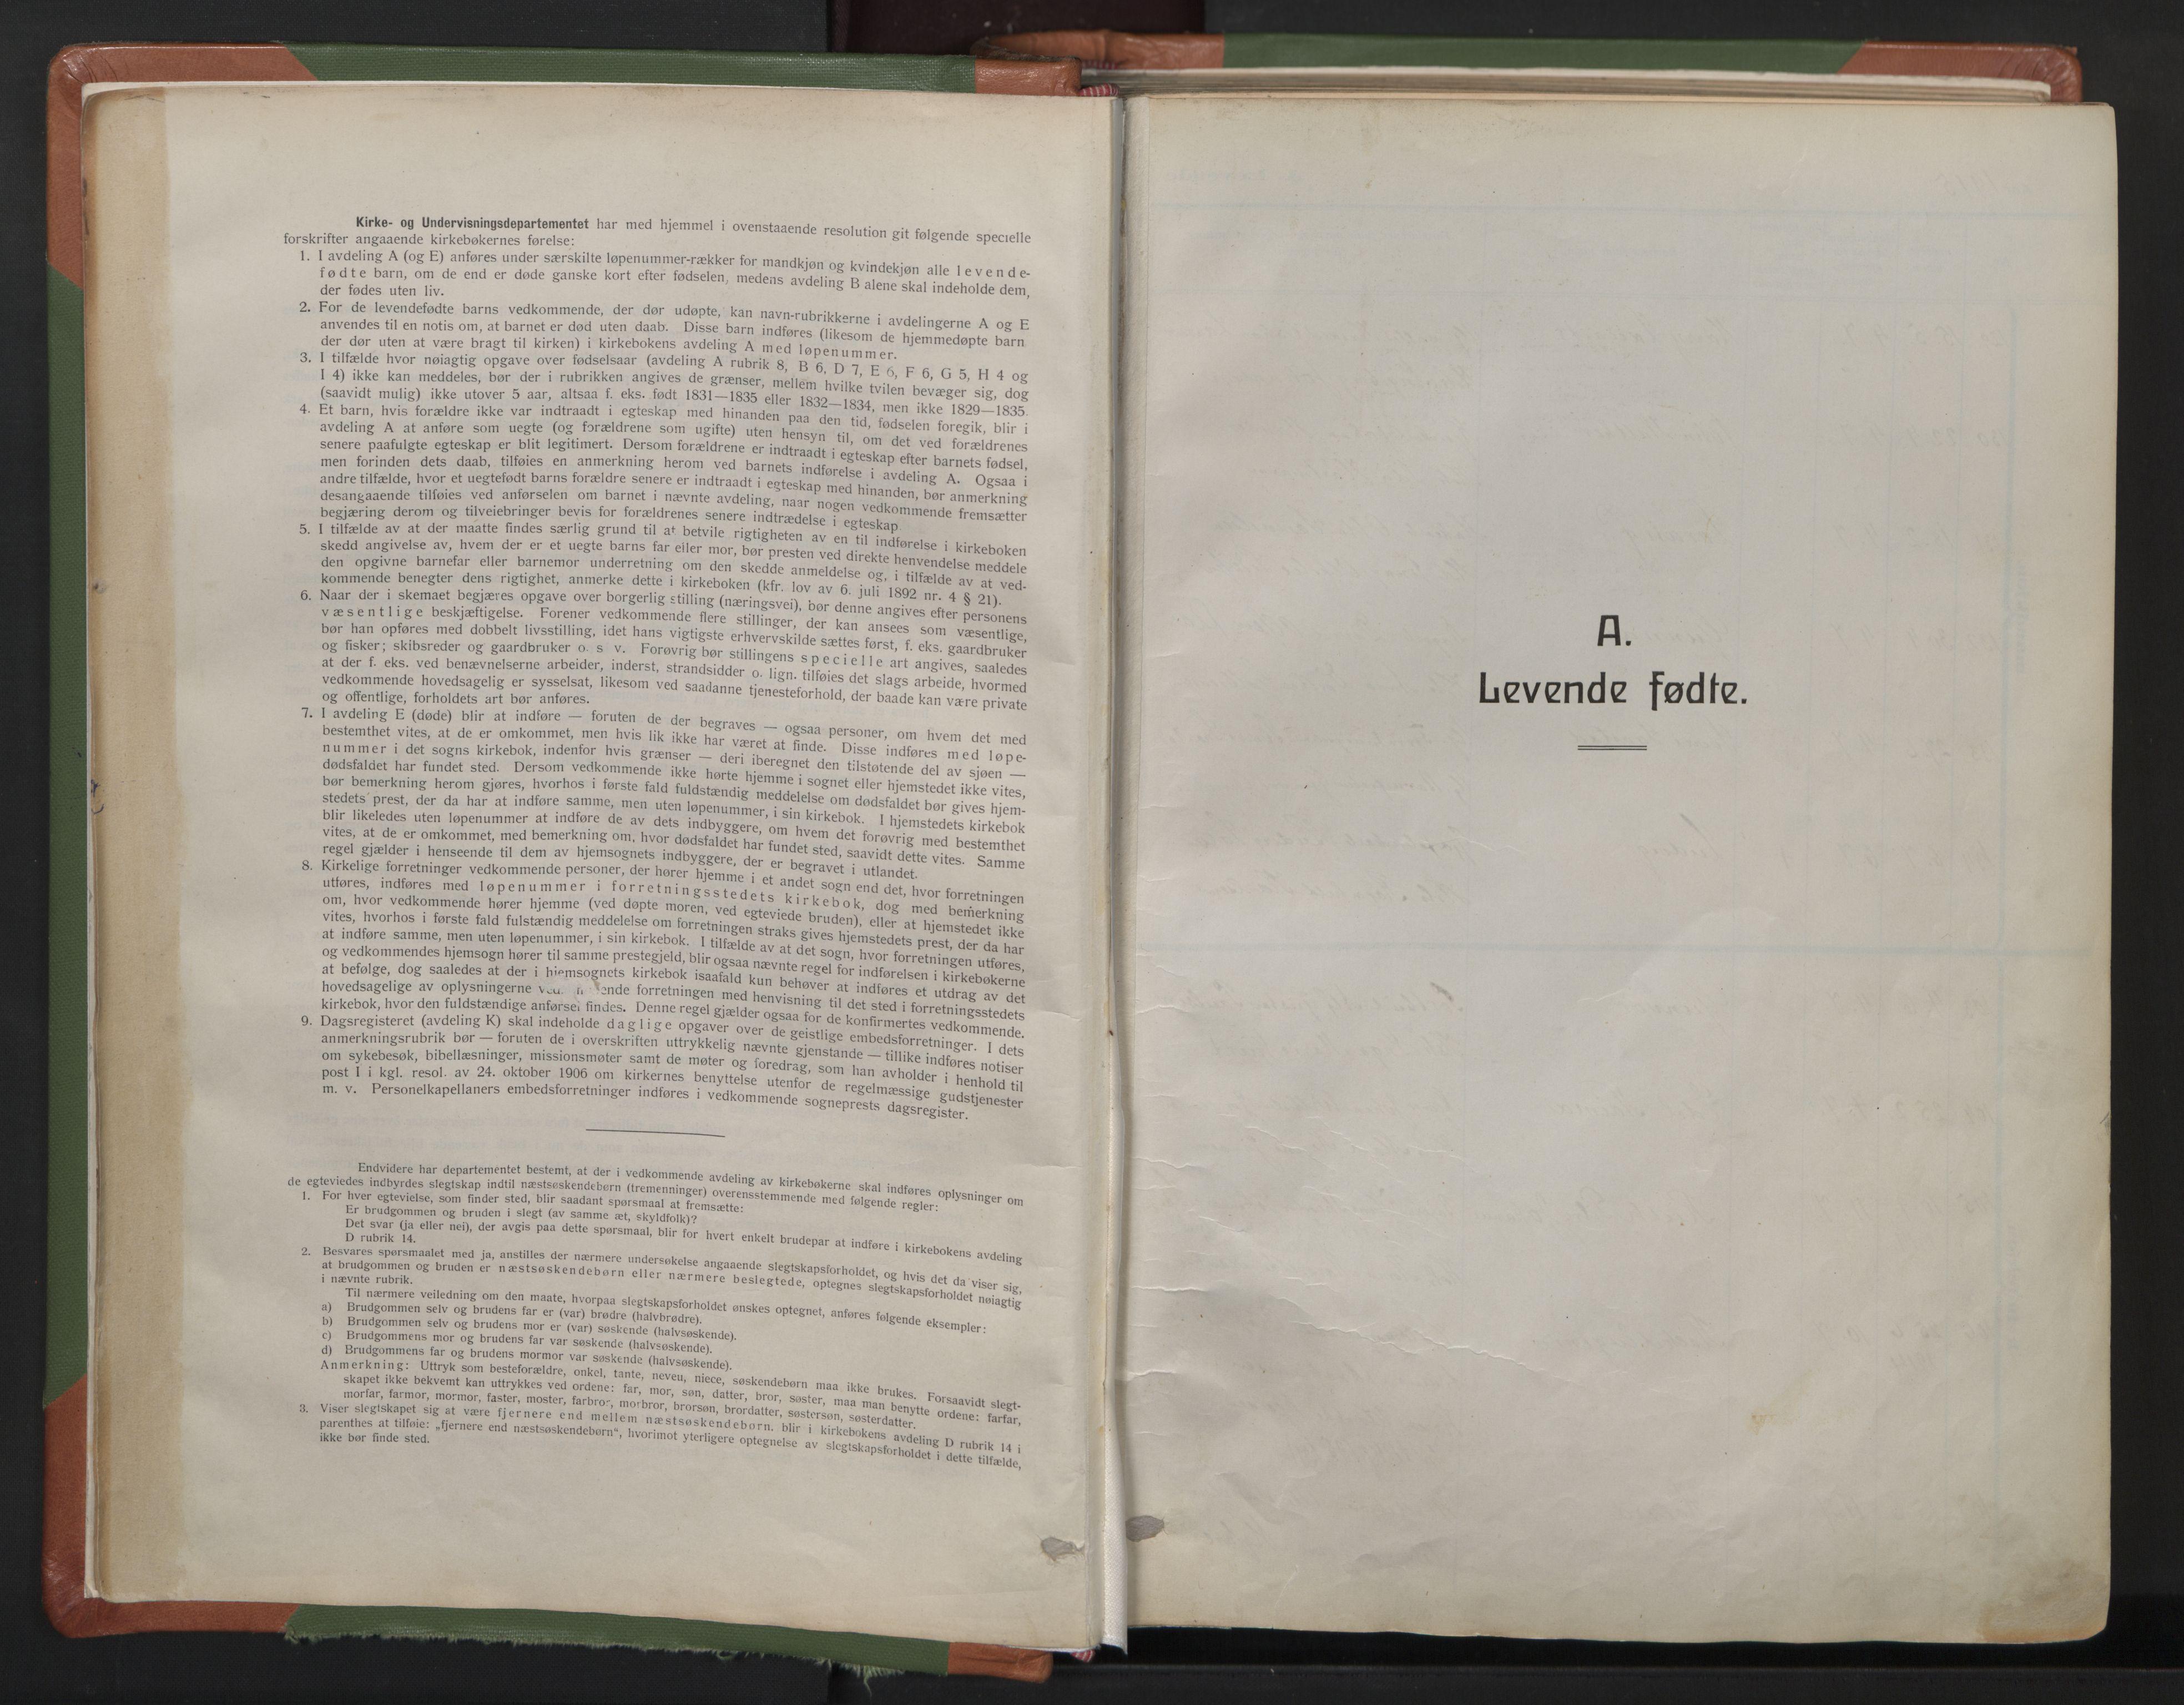 SAO, Sagene prestekontor Kirkebøker, F/L0010: Ministerialbok nr. 10, 1915-1925